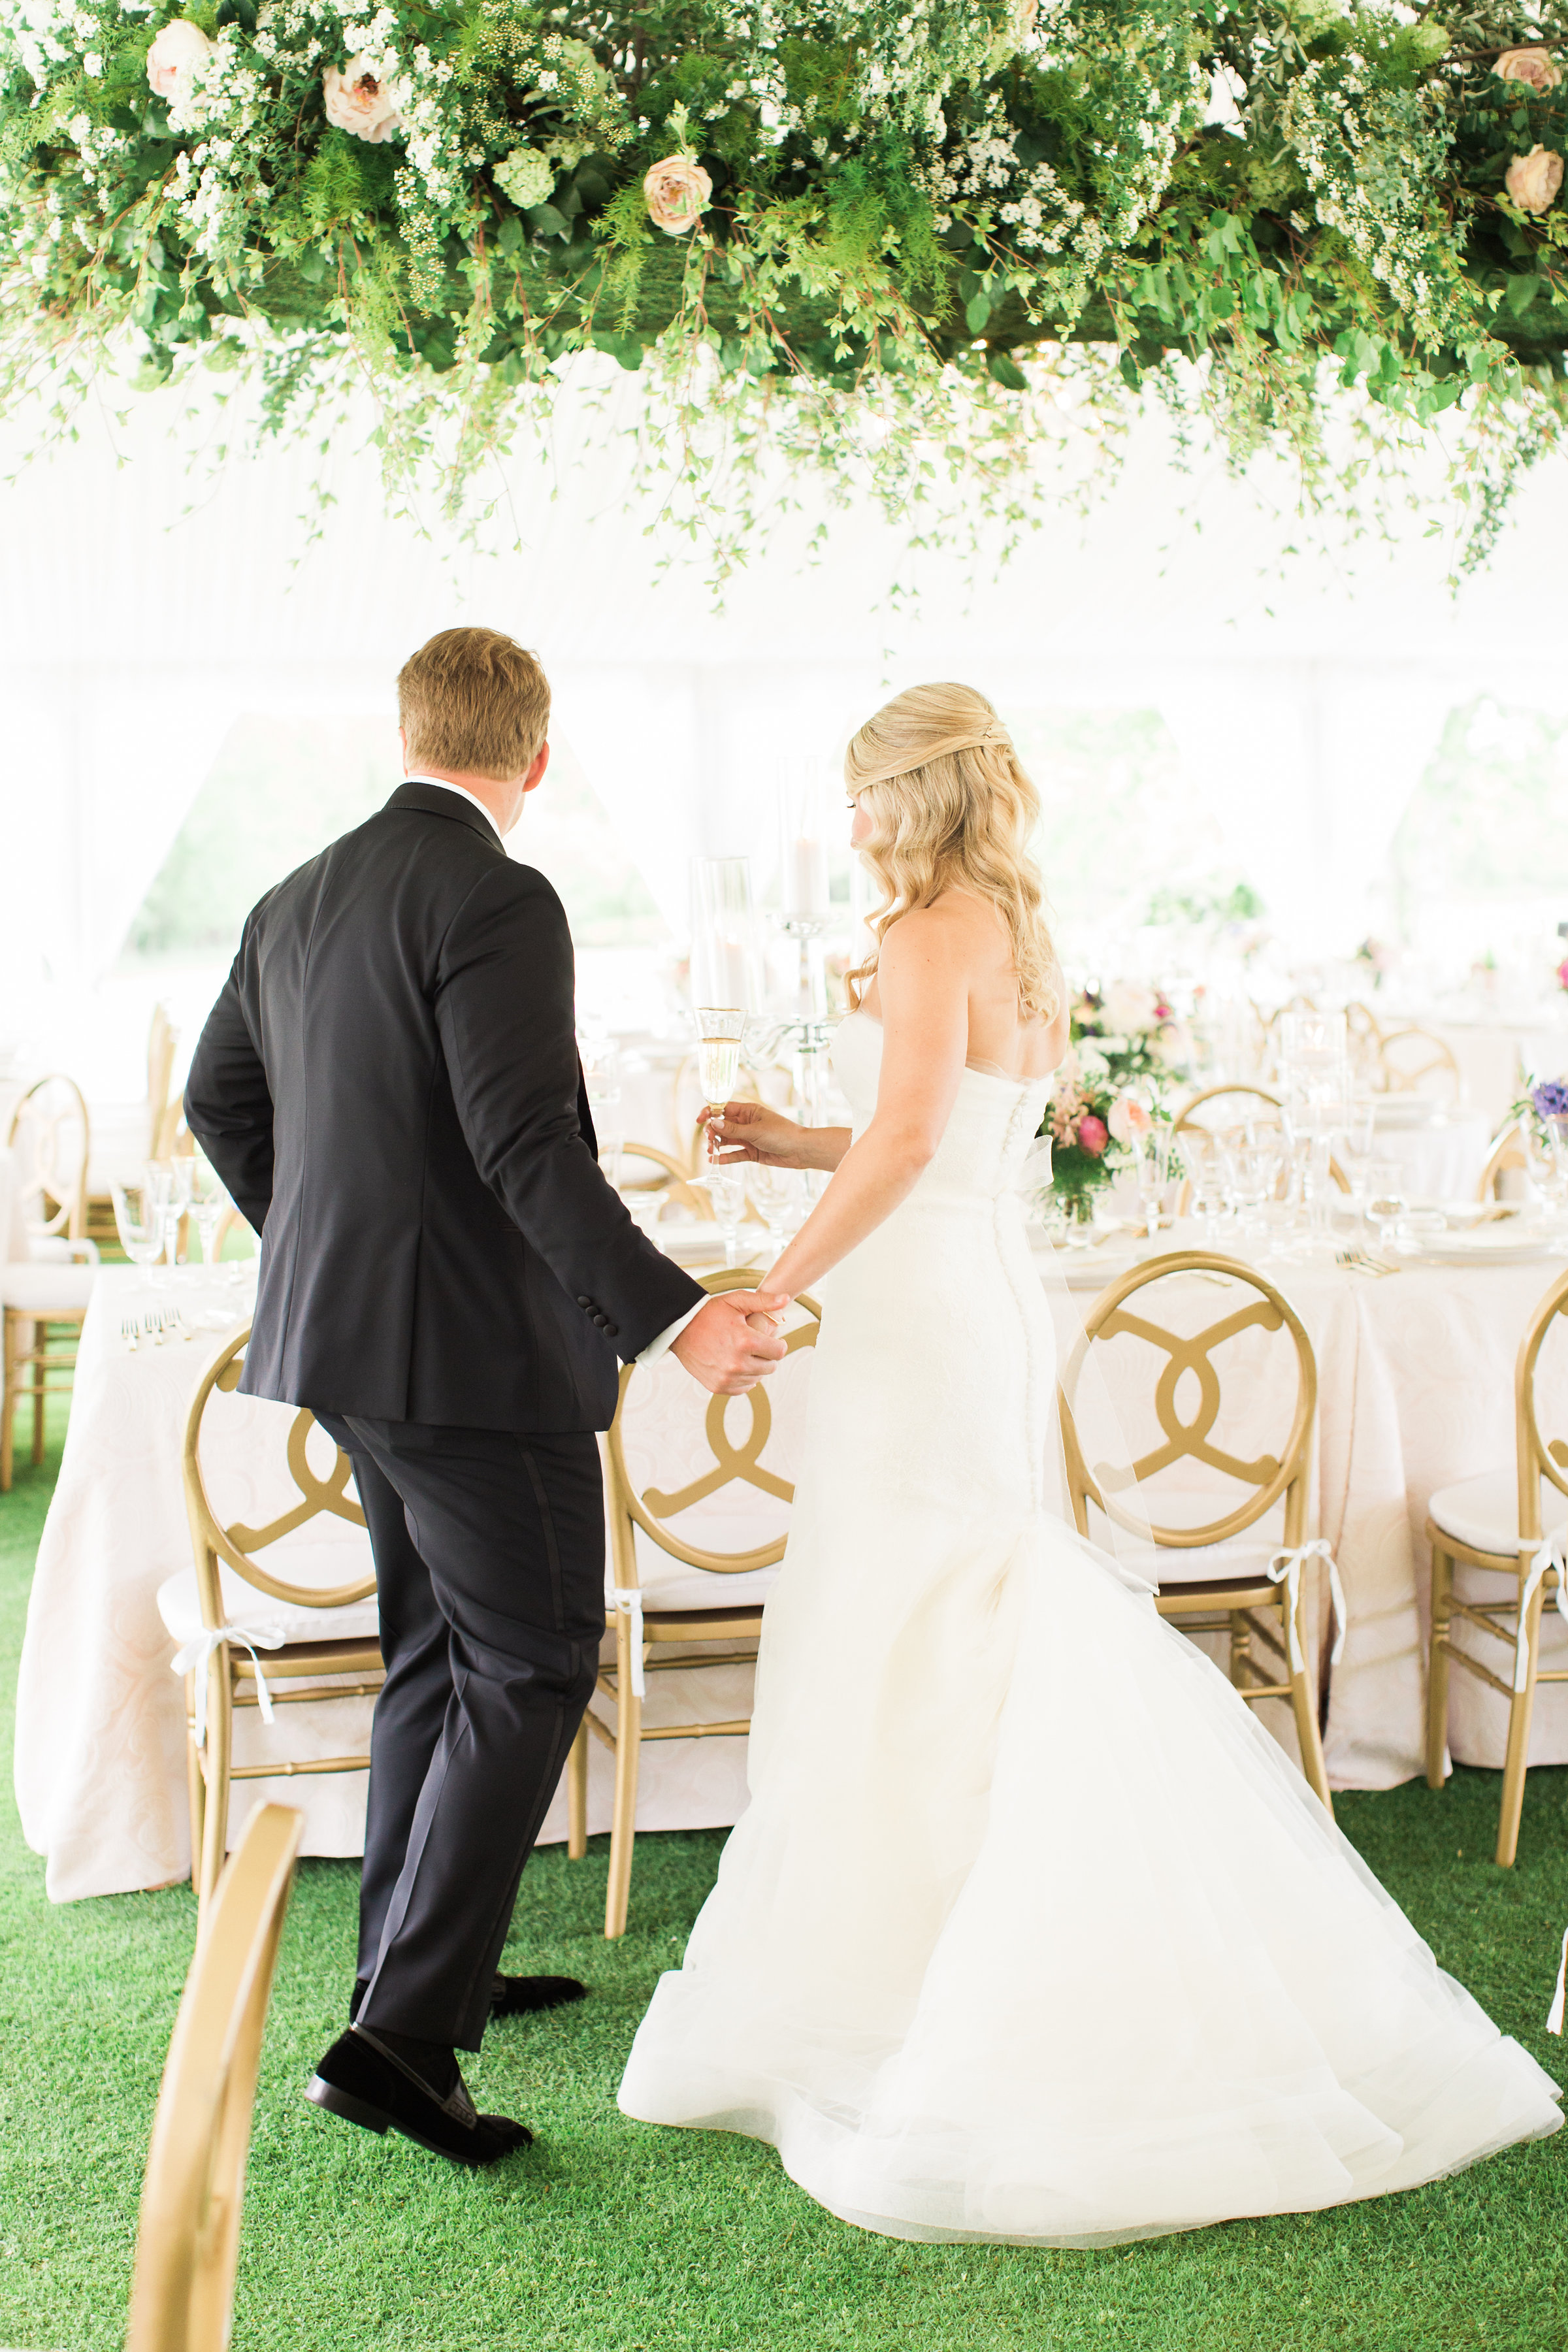 Coffman+Wedding+Cocktail+Hour-7.jpg